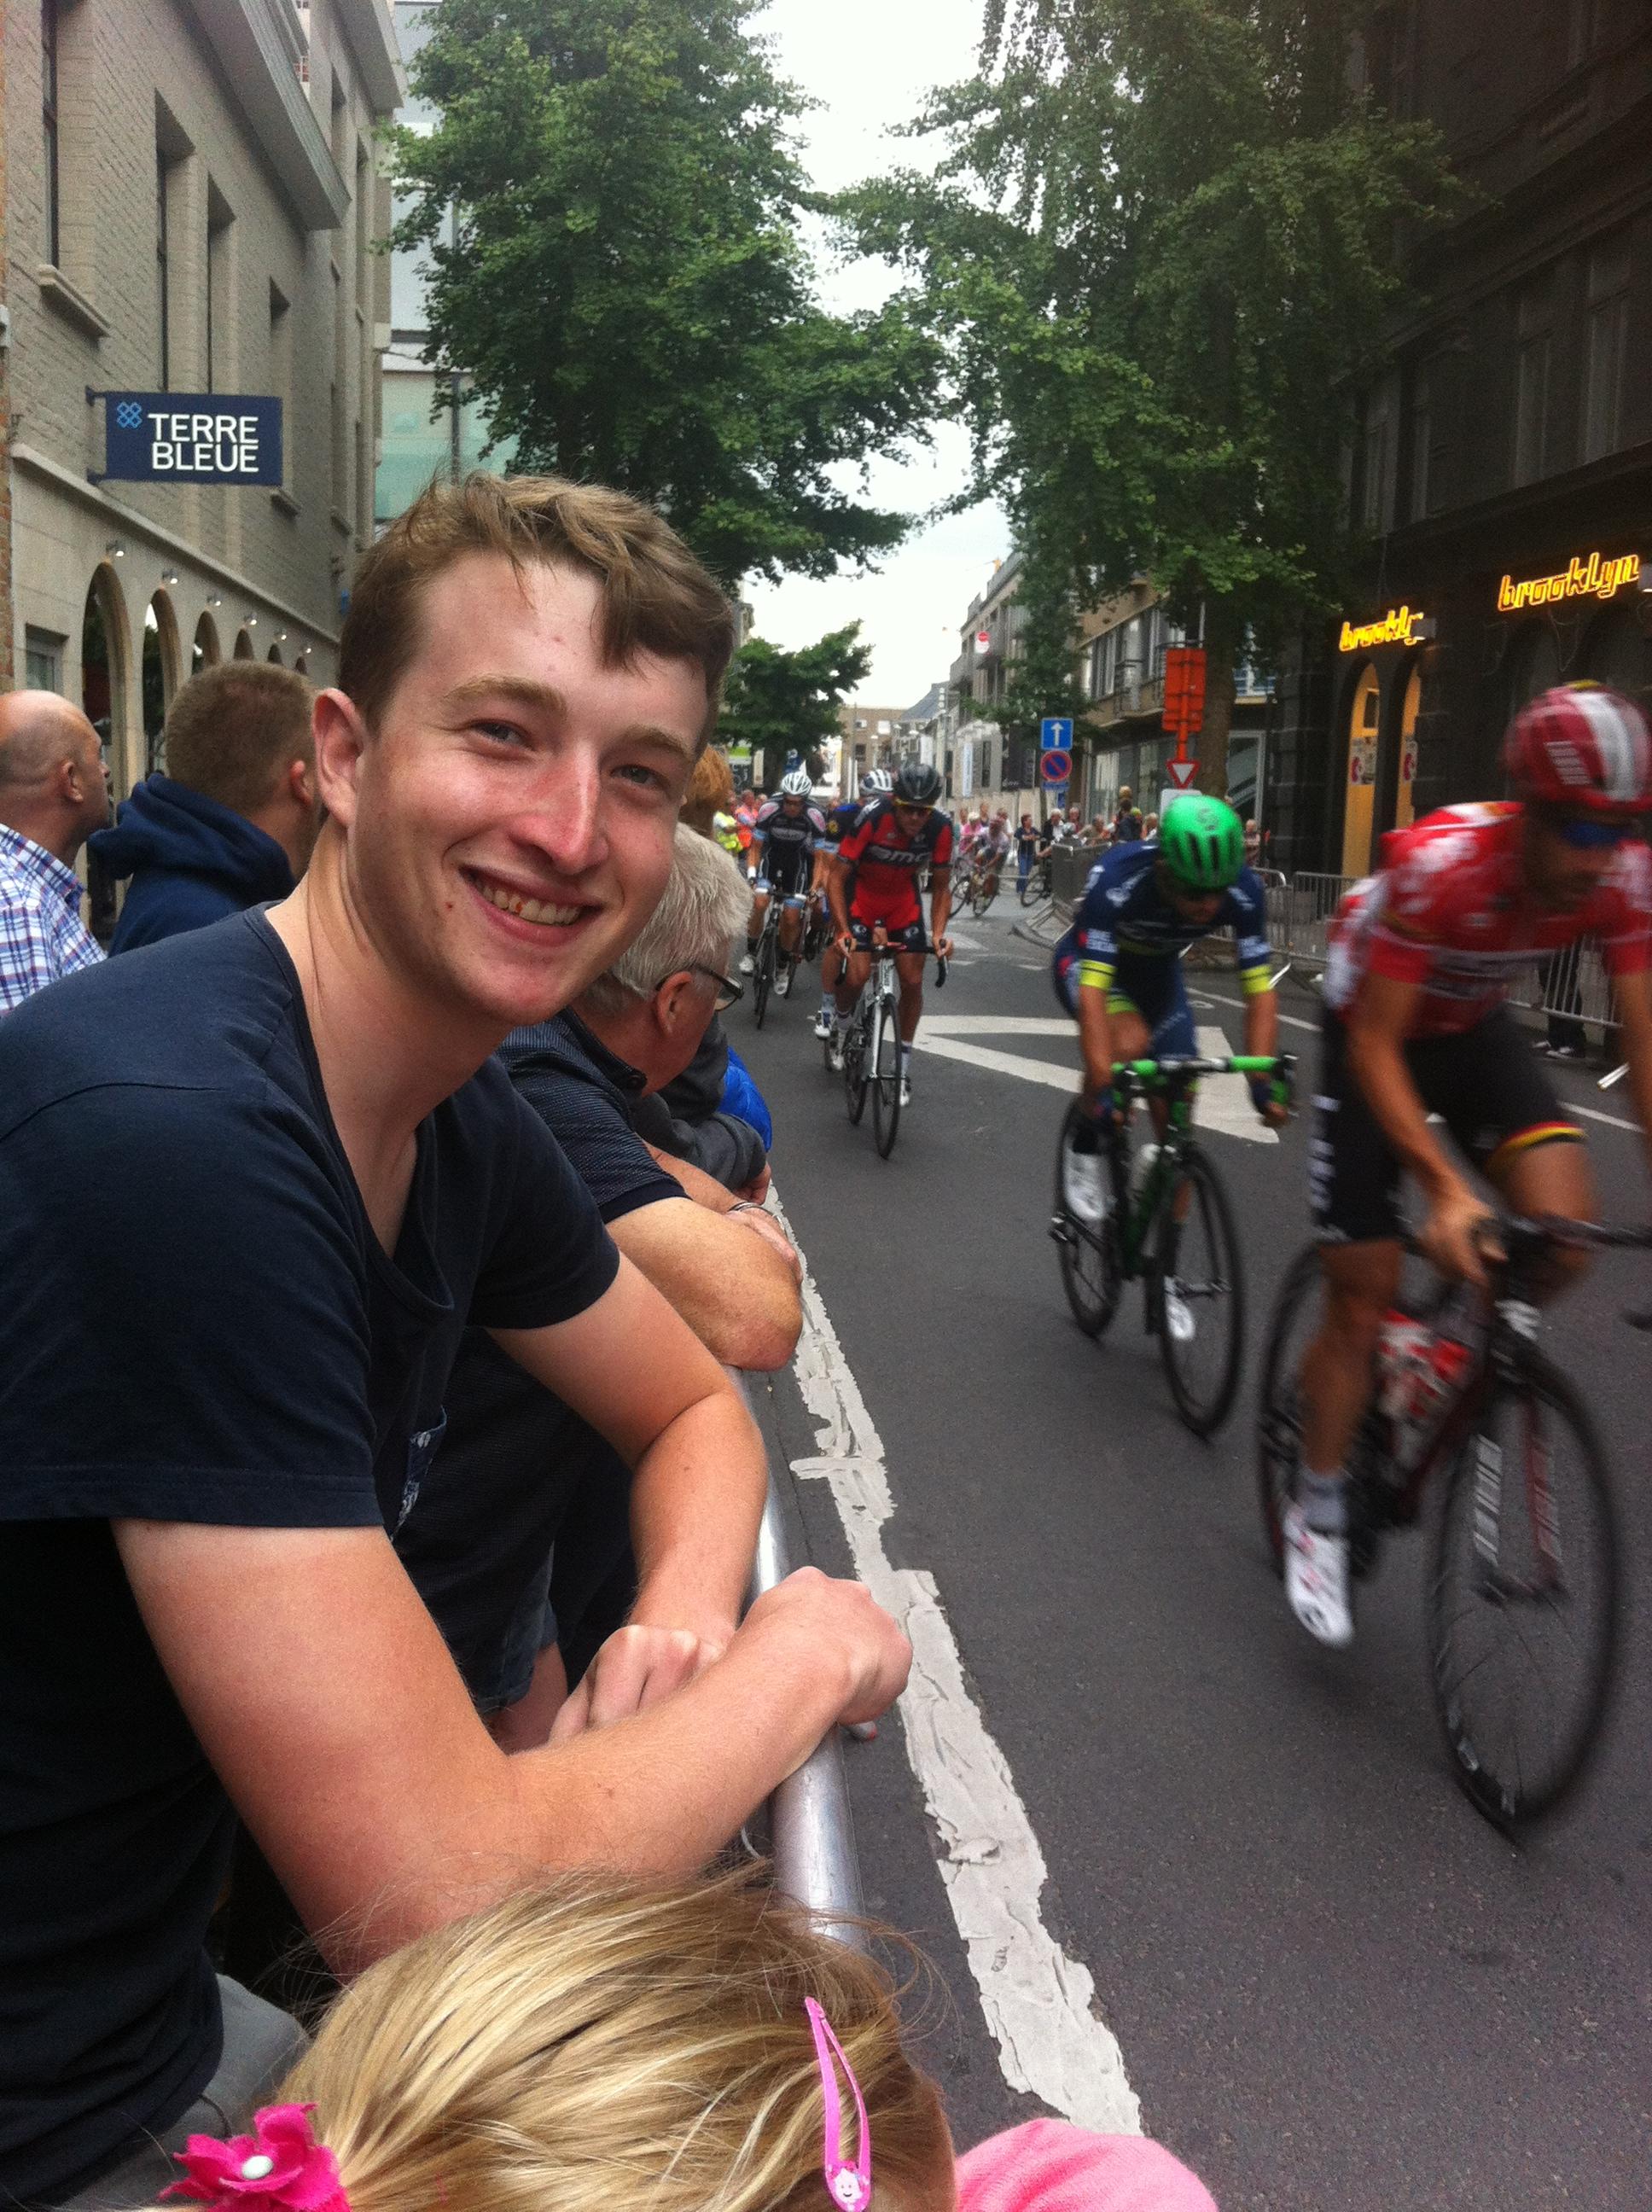 Conor at the Roeselare Criterium with Greg Van Avermatt, Michael Matthews,  Thomas De Gendt & friends